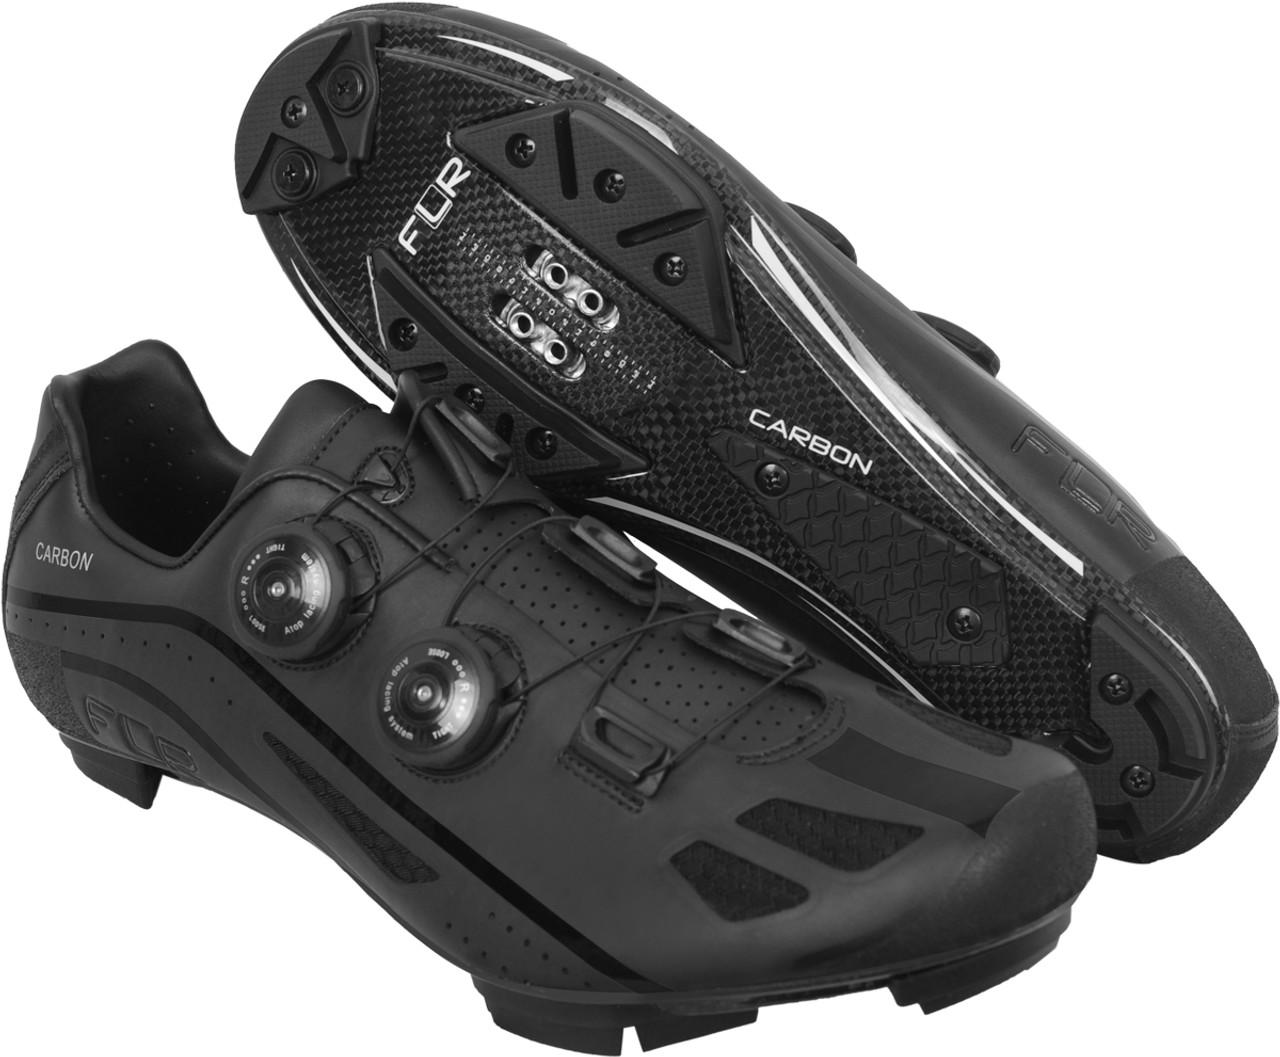 FLR F-95X Strawweight MTB Race Full Carbon Sole Shoe in Matt BlackAll Sizes